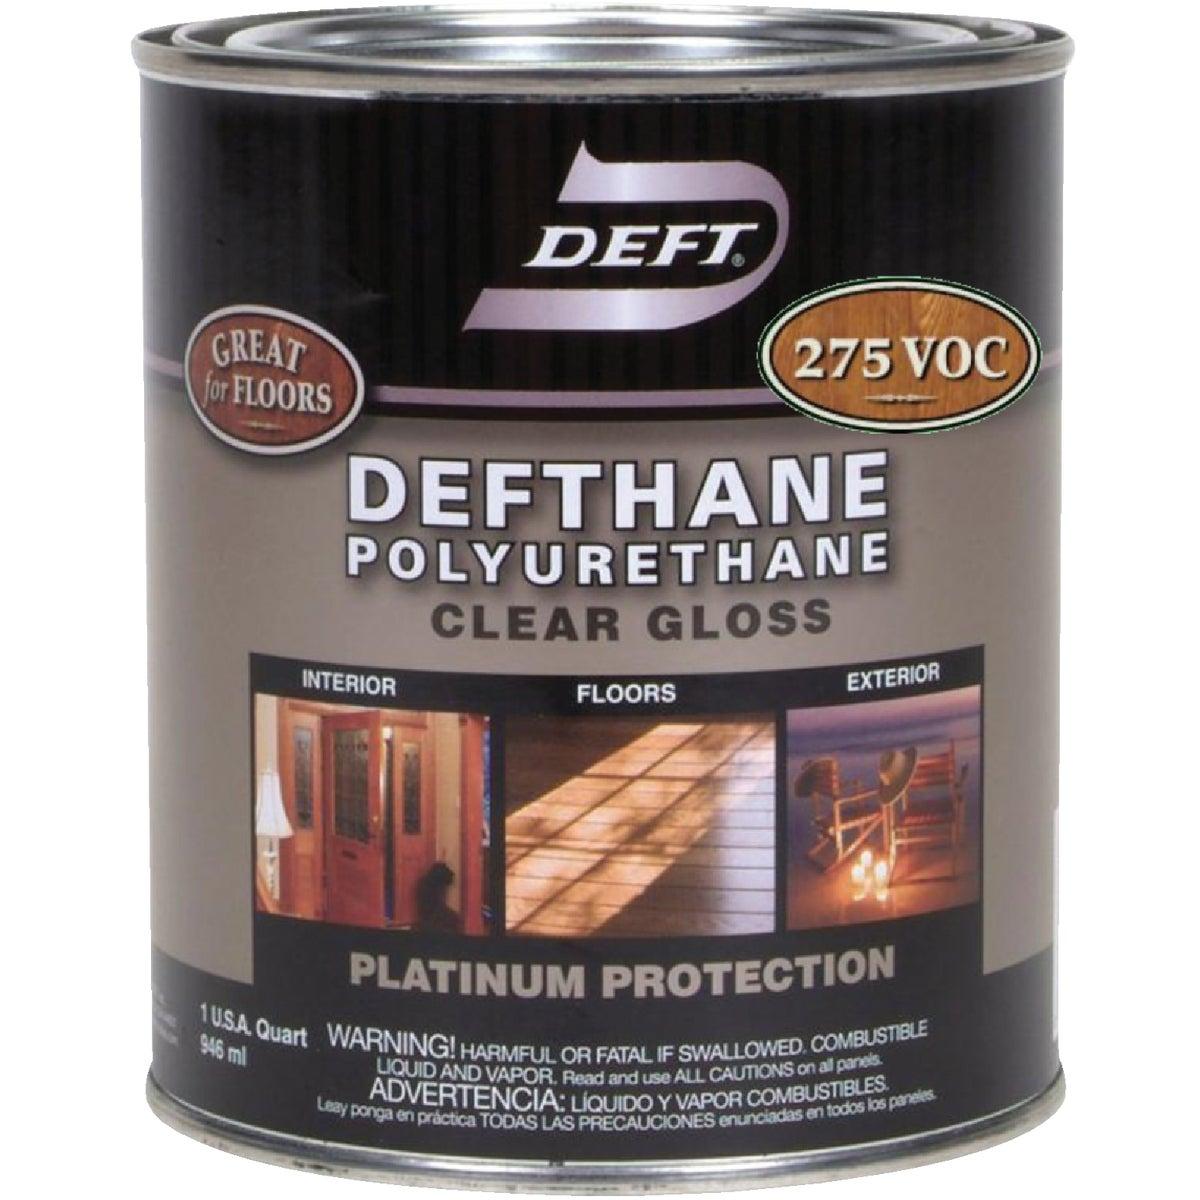 275 VOC GLOSS DEFTHANE - DFT021/04 by Deft